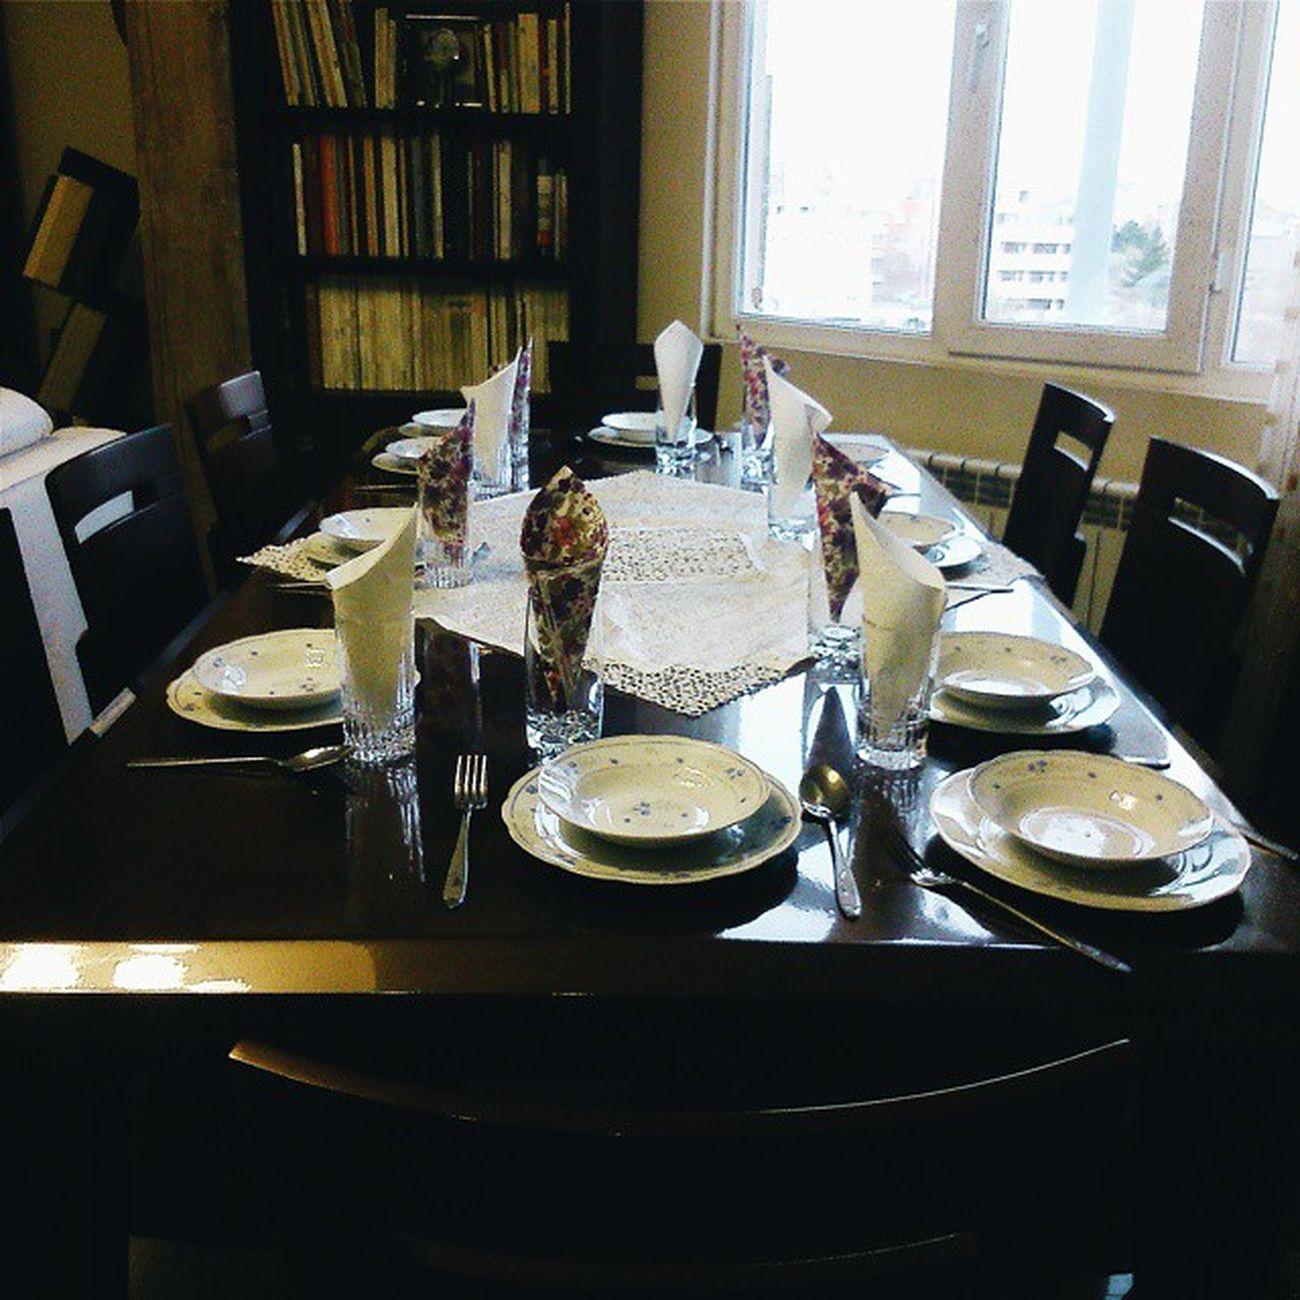 وقتی مسوولیت میز با ی هنرمند باشه :))) . پ.ن: هنرمند منم :)))))))